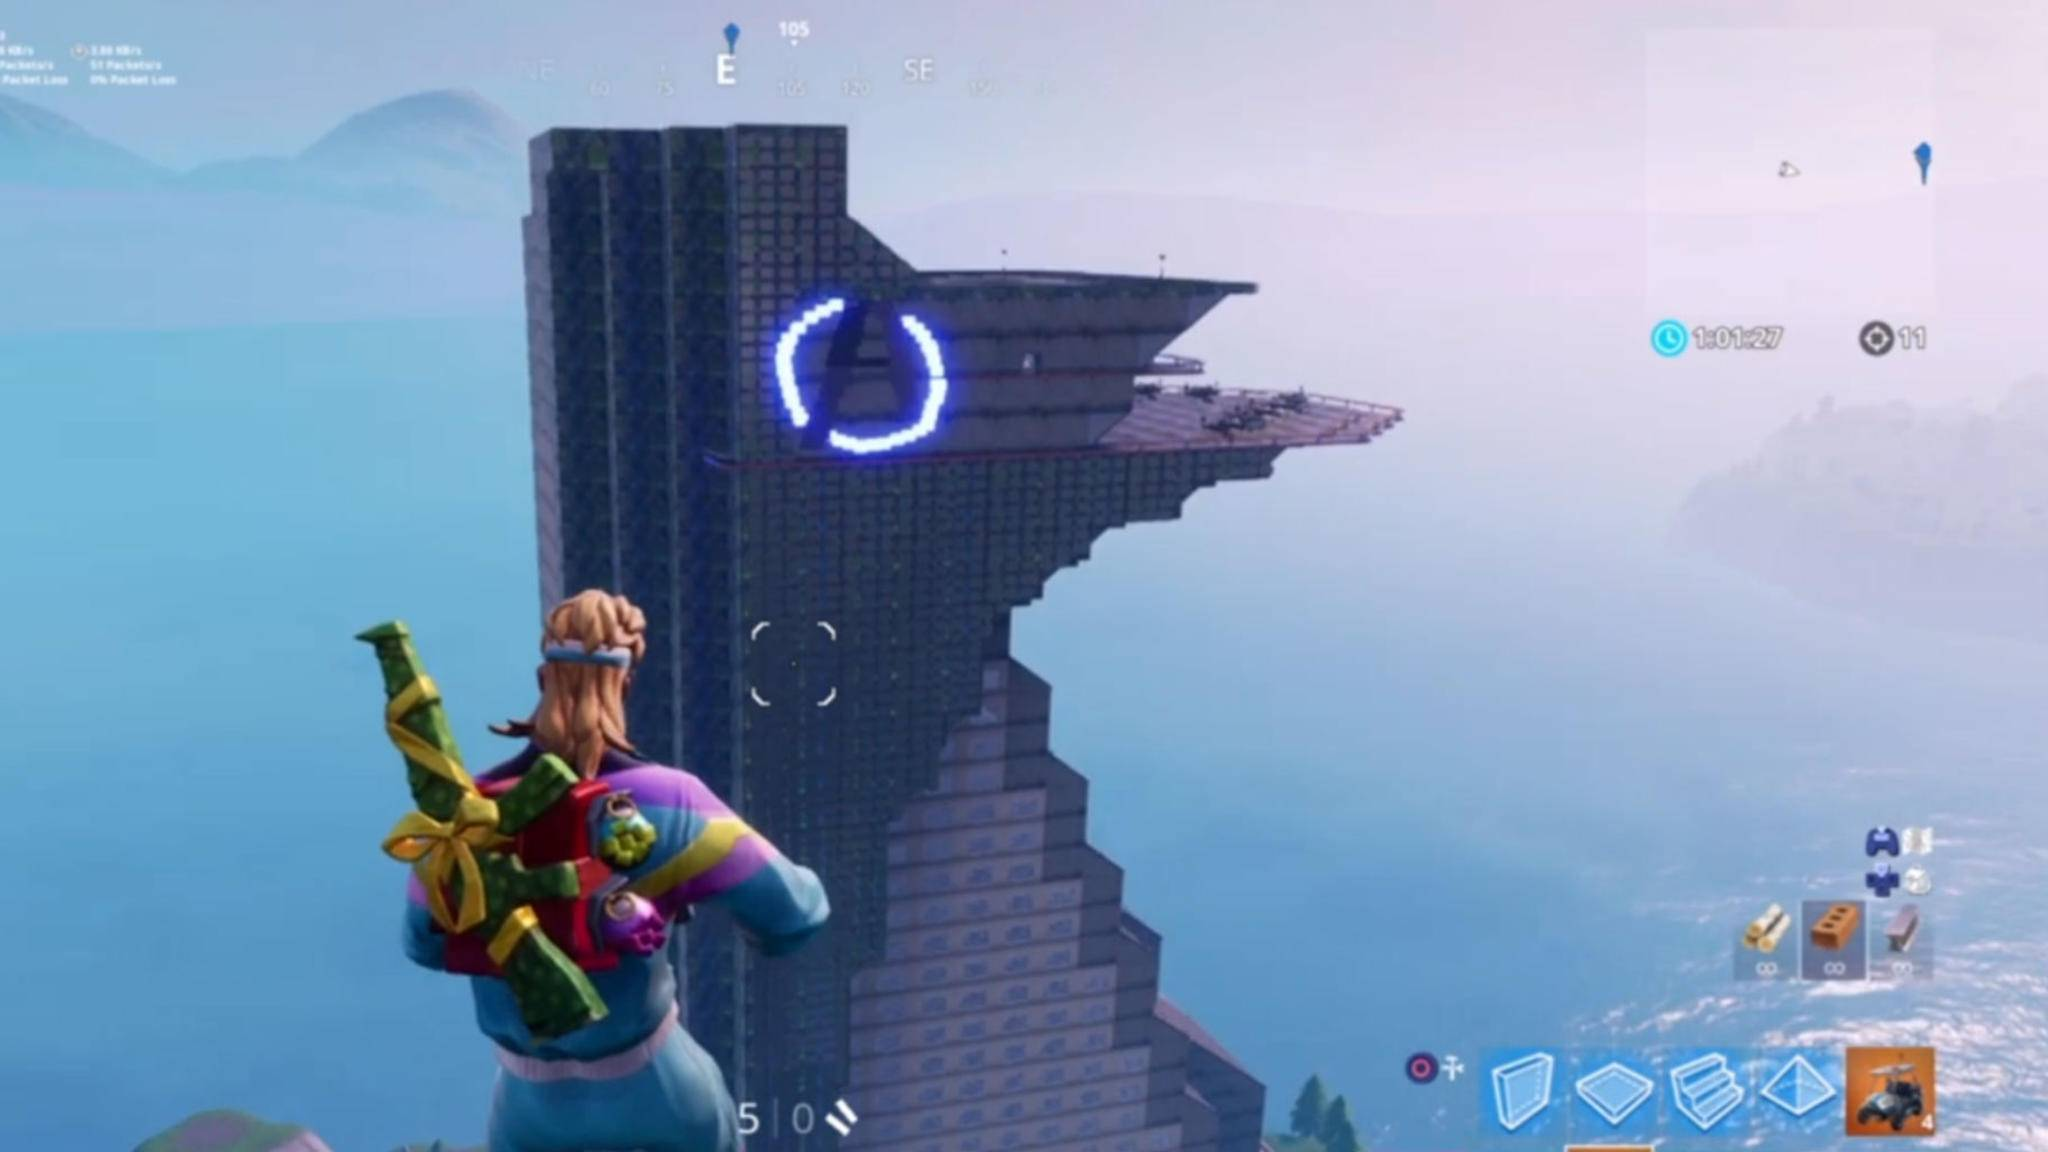 Fortnite Gigantisch Fan Baut Avengers Tower Im Kreativmodus Nach